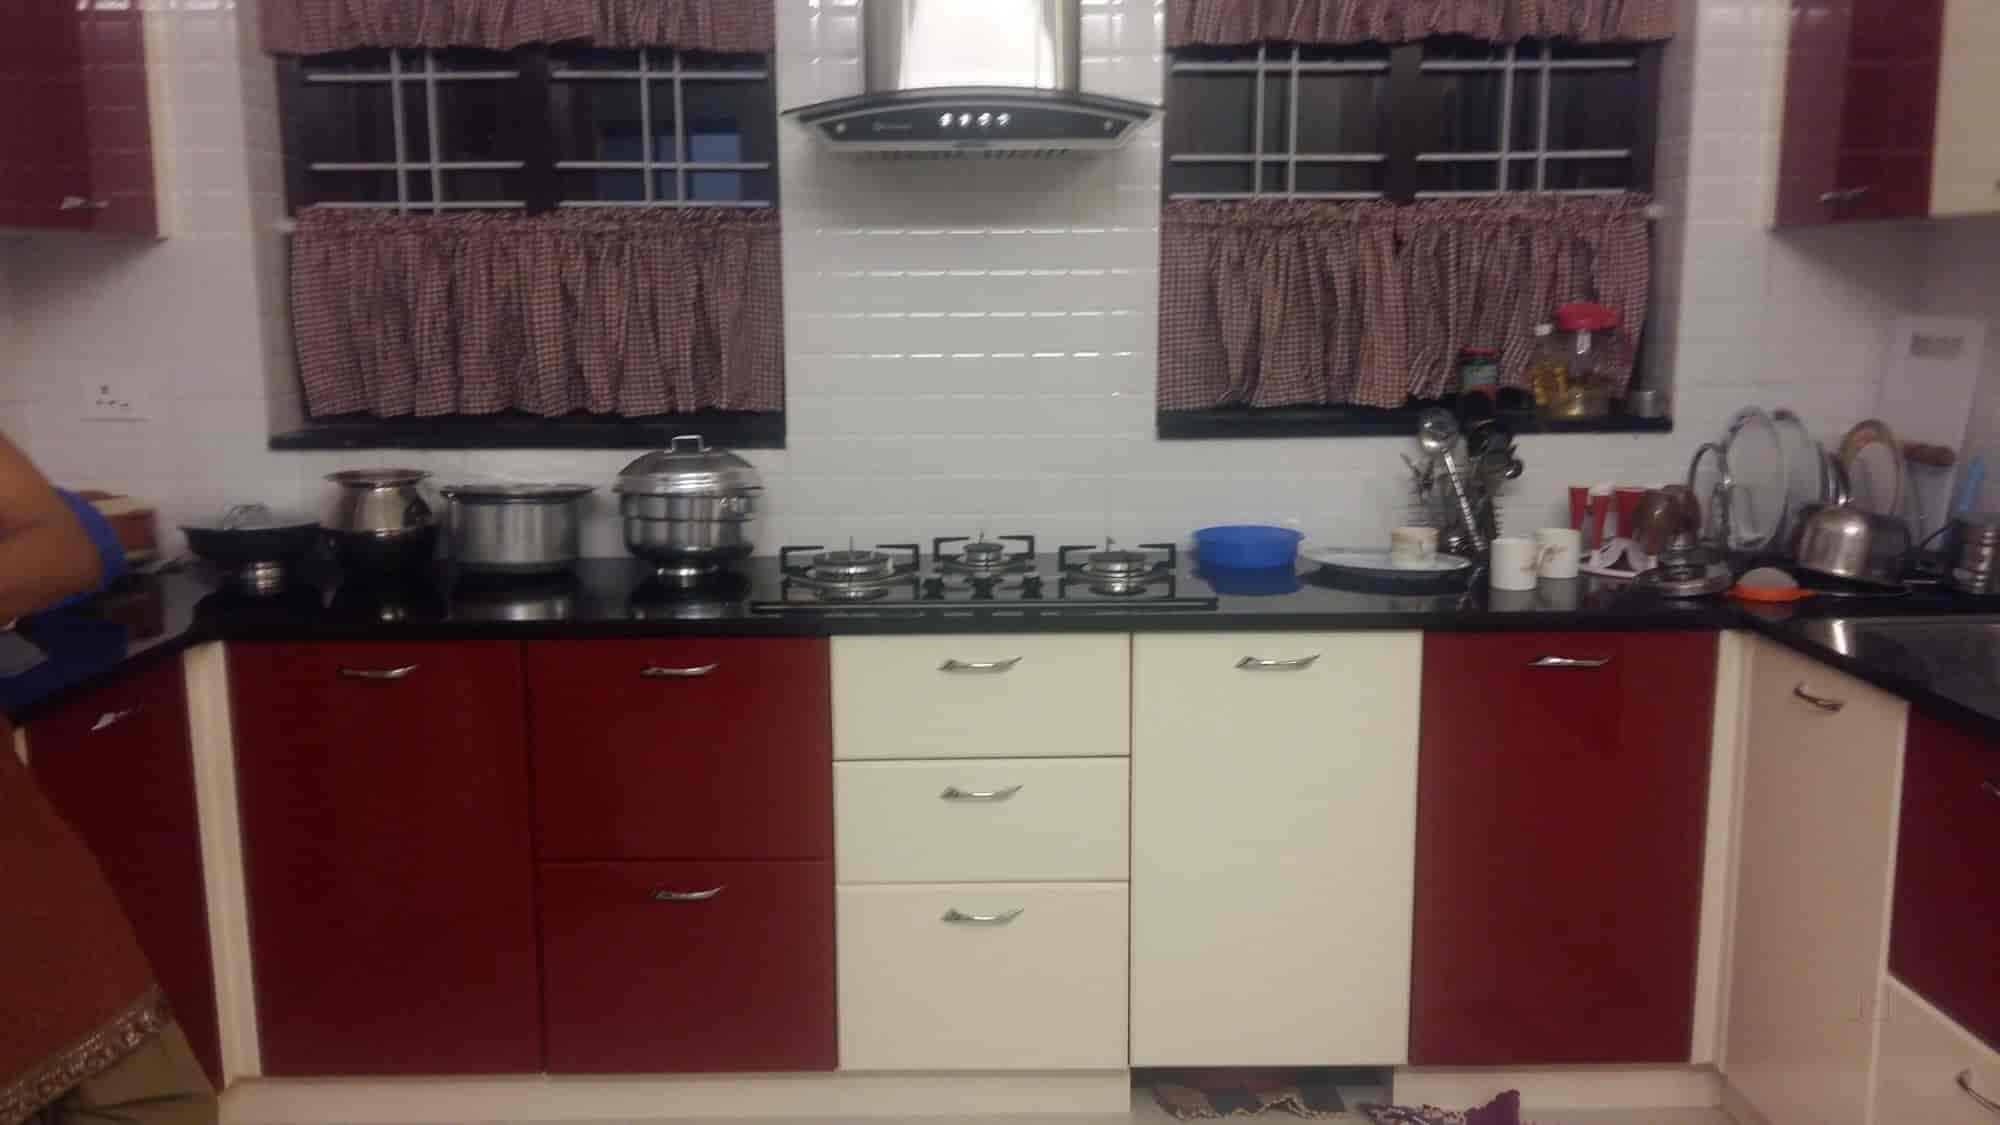 ... Kitchen Cabinet - Corona Kitchen And Wardrobe Photos, Vadavathoor, Kottayam - Modular Kitchen Manufacturers ...